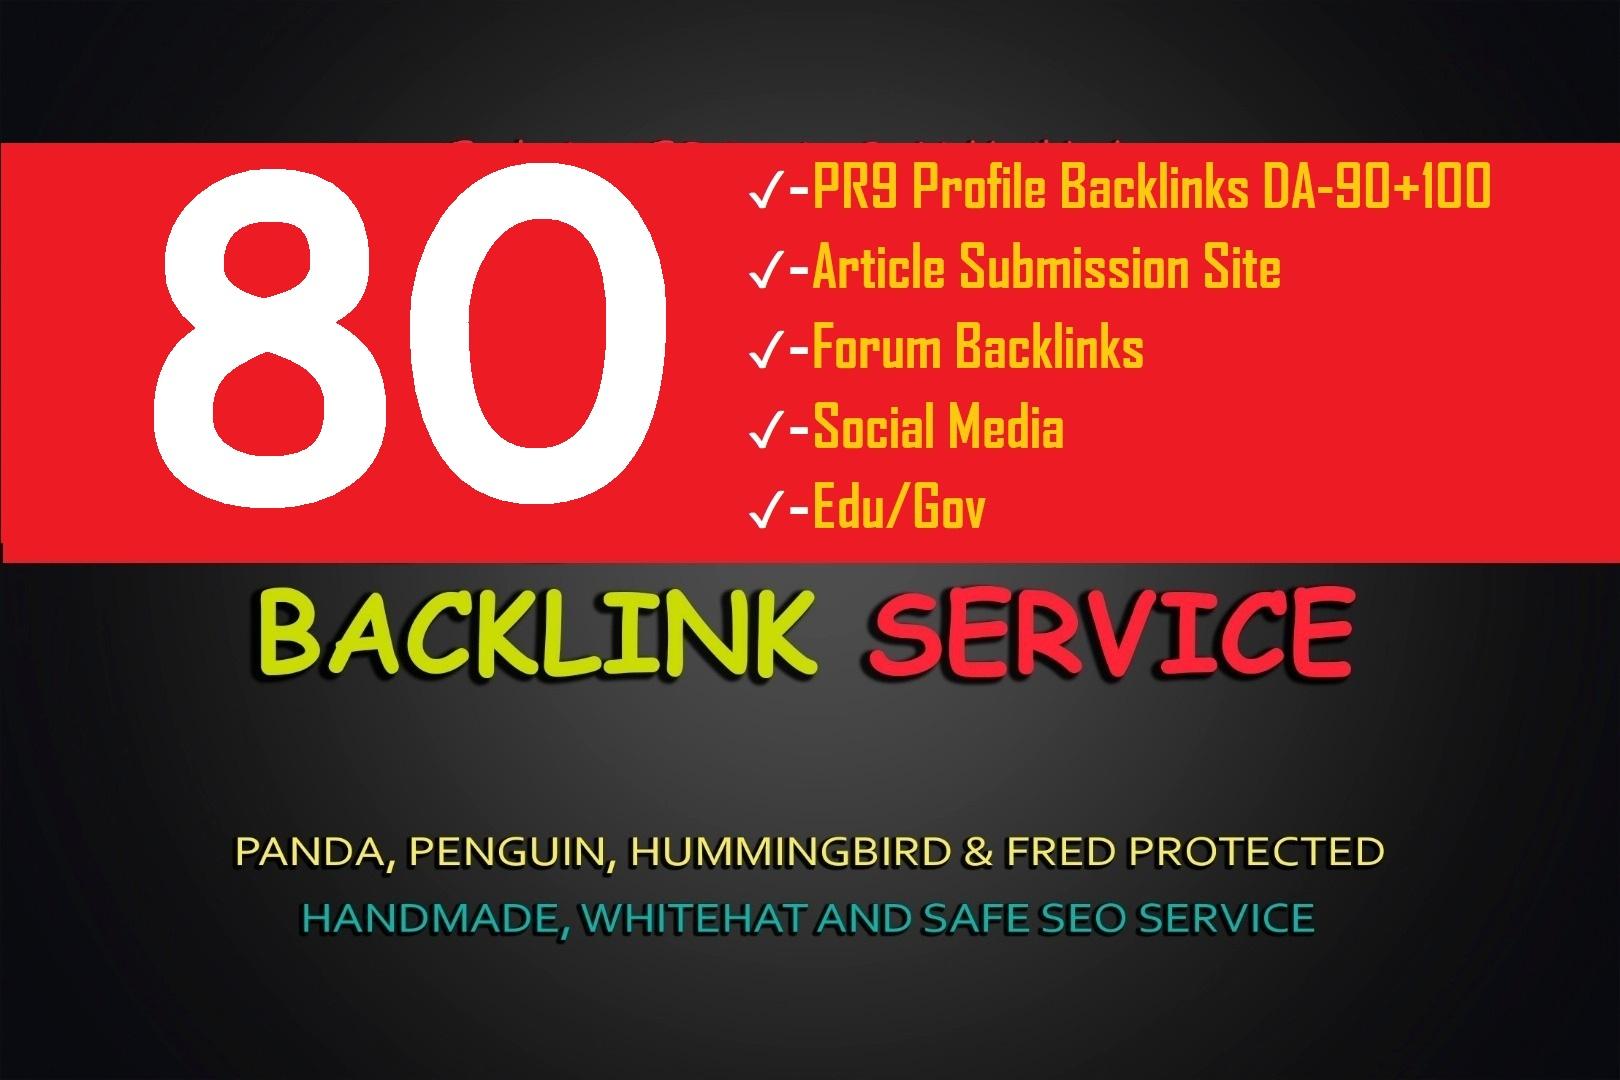 5 Step 80 SEO Backlinks Biggest PR9/EDU/Social Media/Article Submission Create For Google 1st Rankb